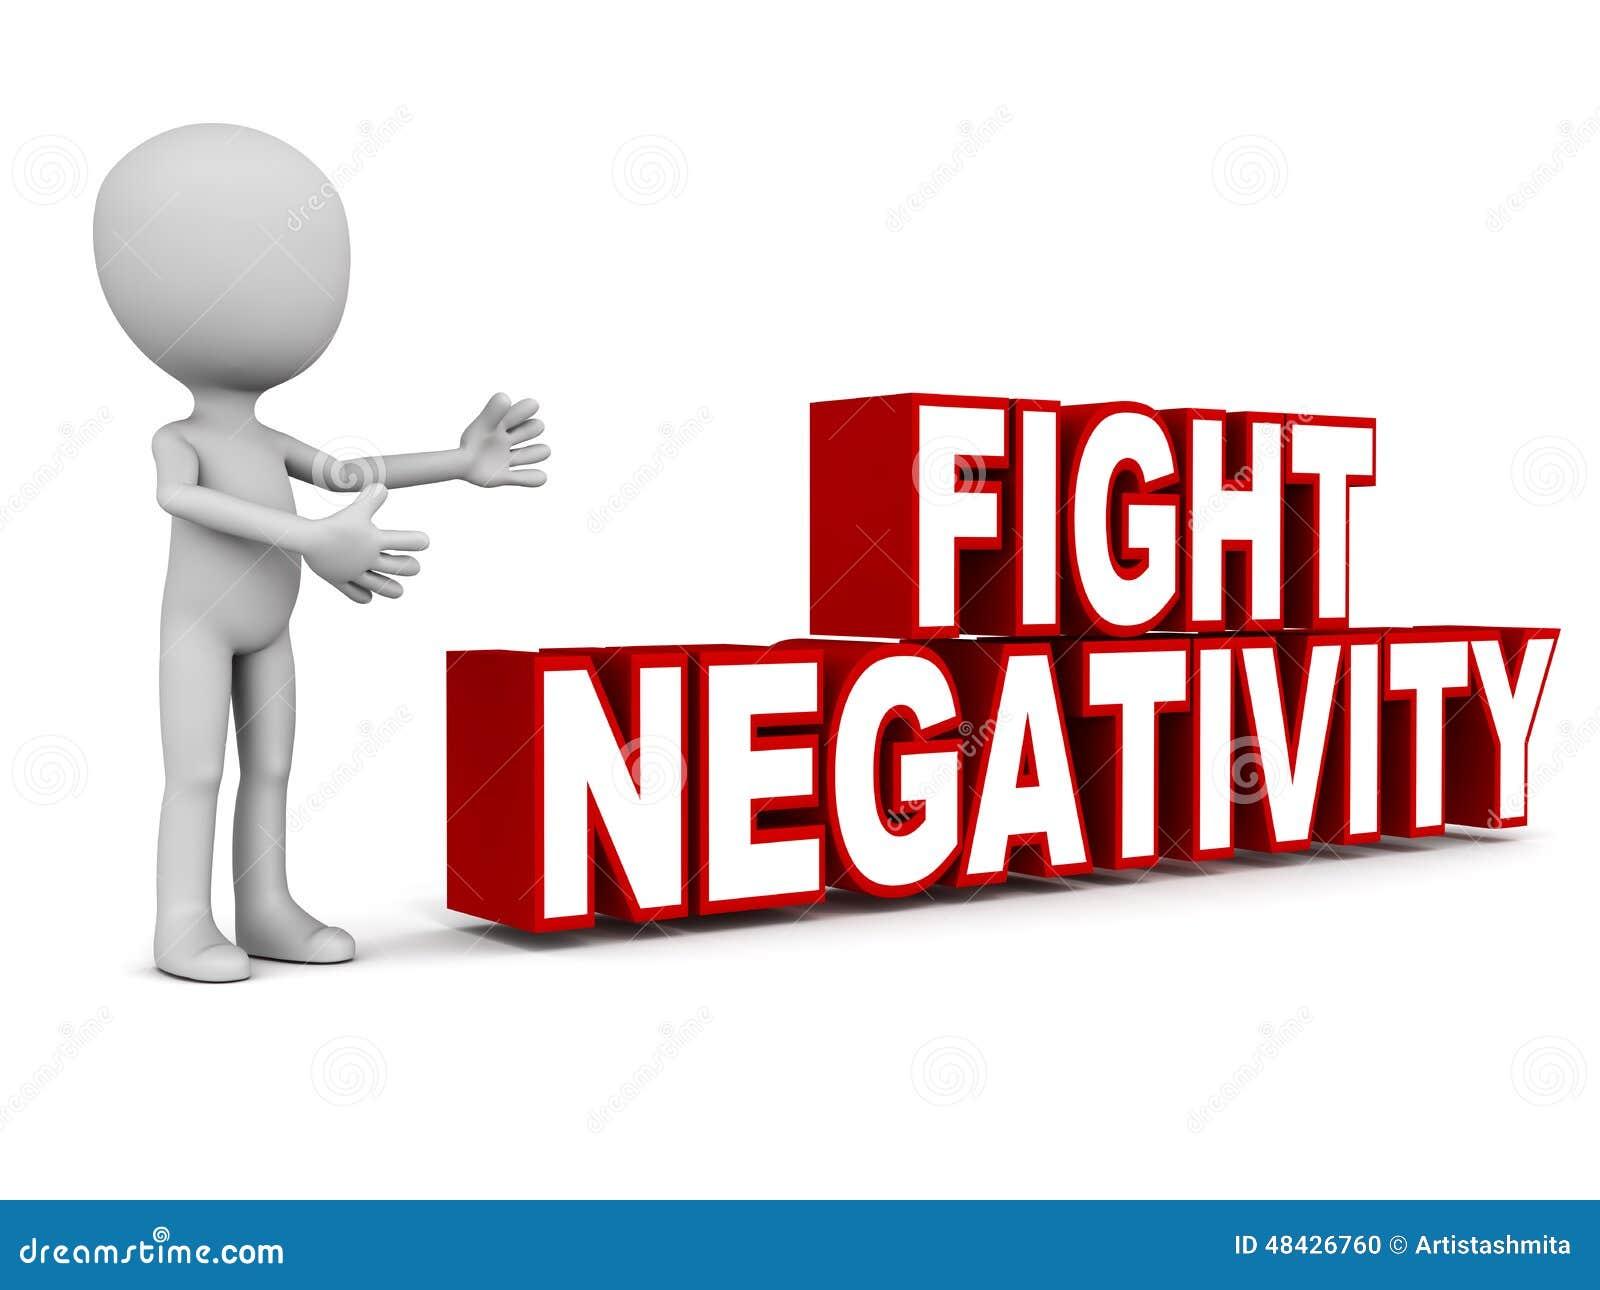 Негативизм фото